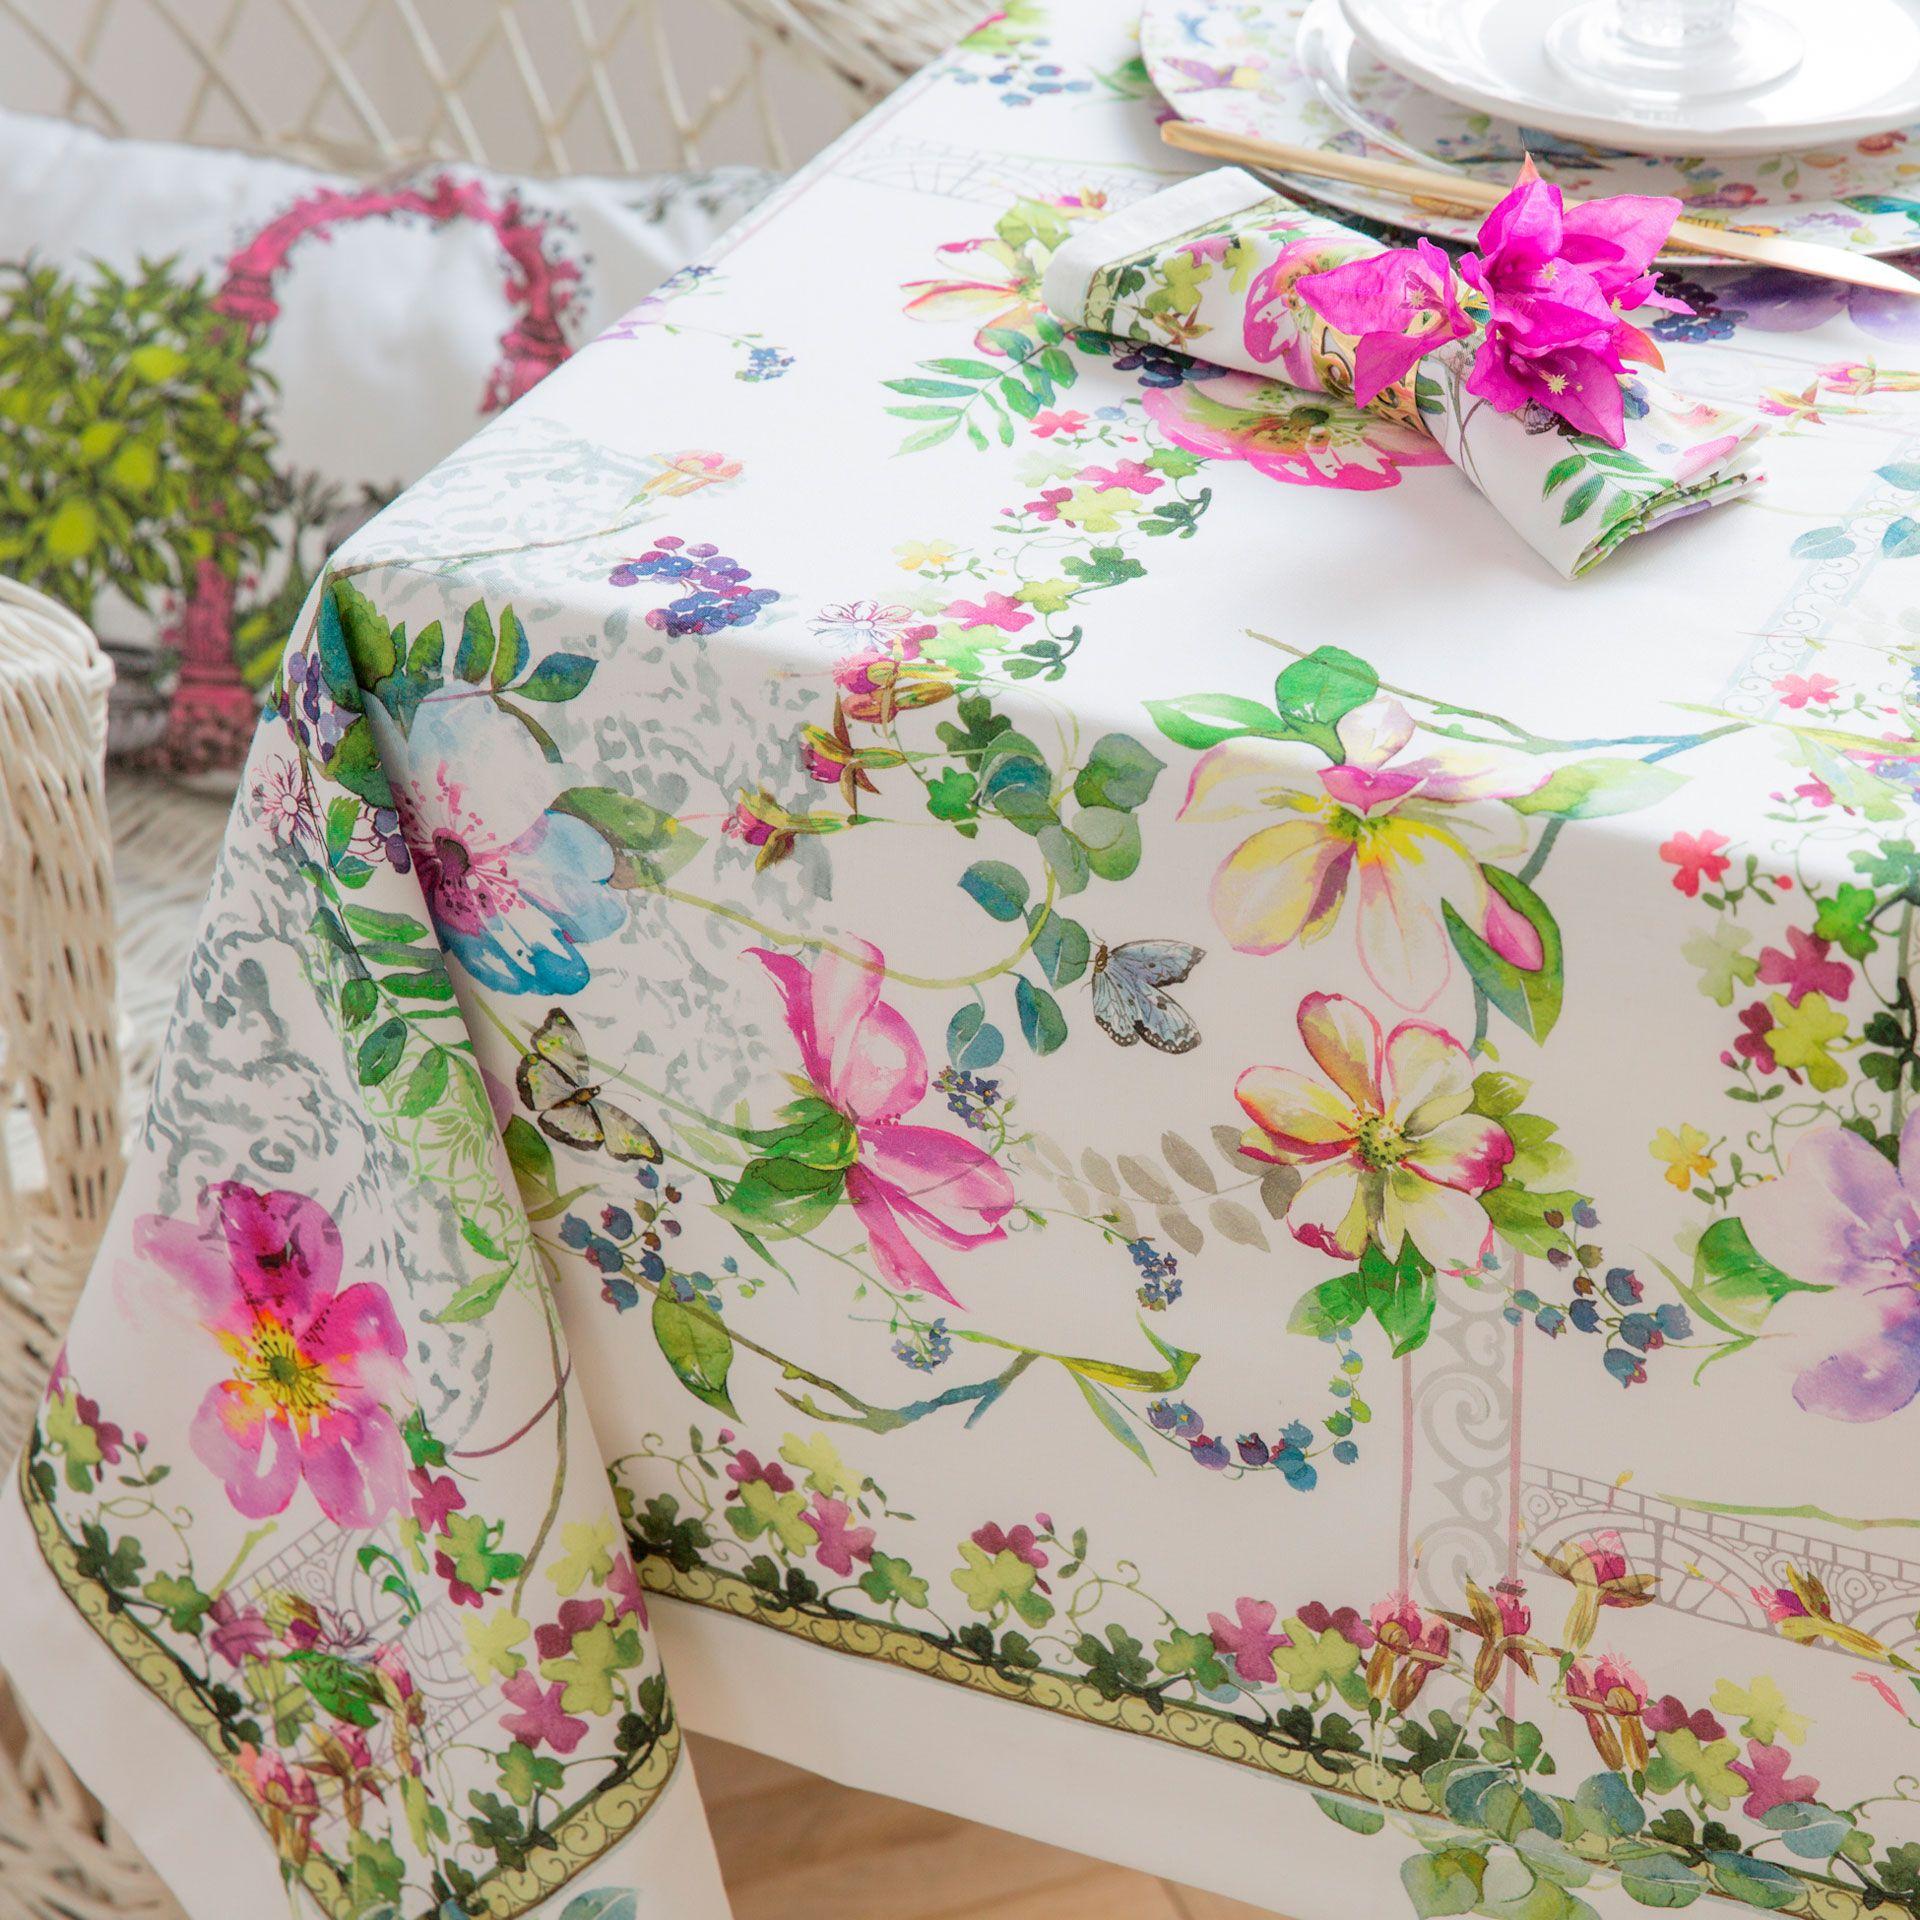 Awesome SPRING PRINT TABLECLOTH AND NAPKIN   Tablecloths U0026 Napkins   Tableware    Zara Home United